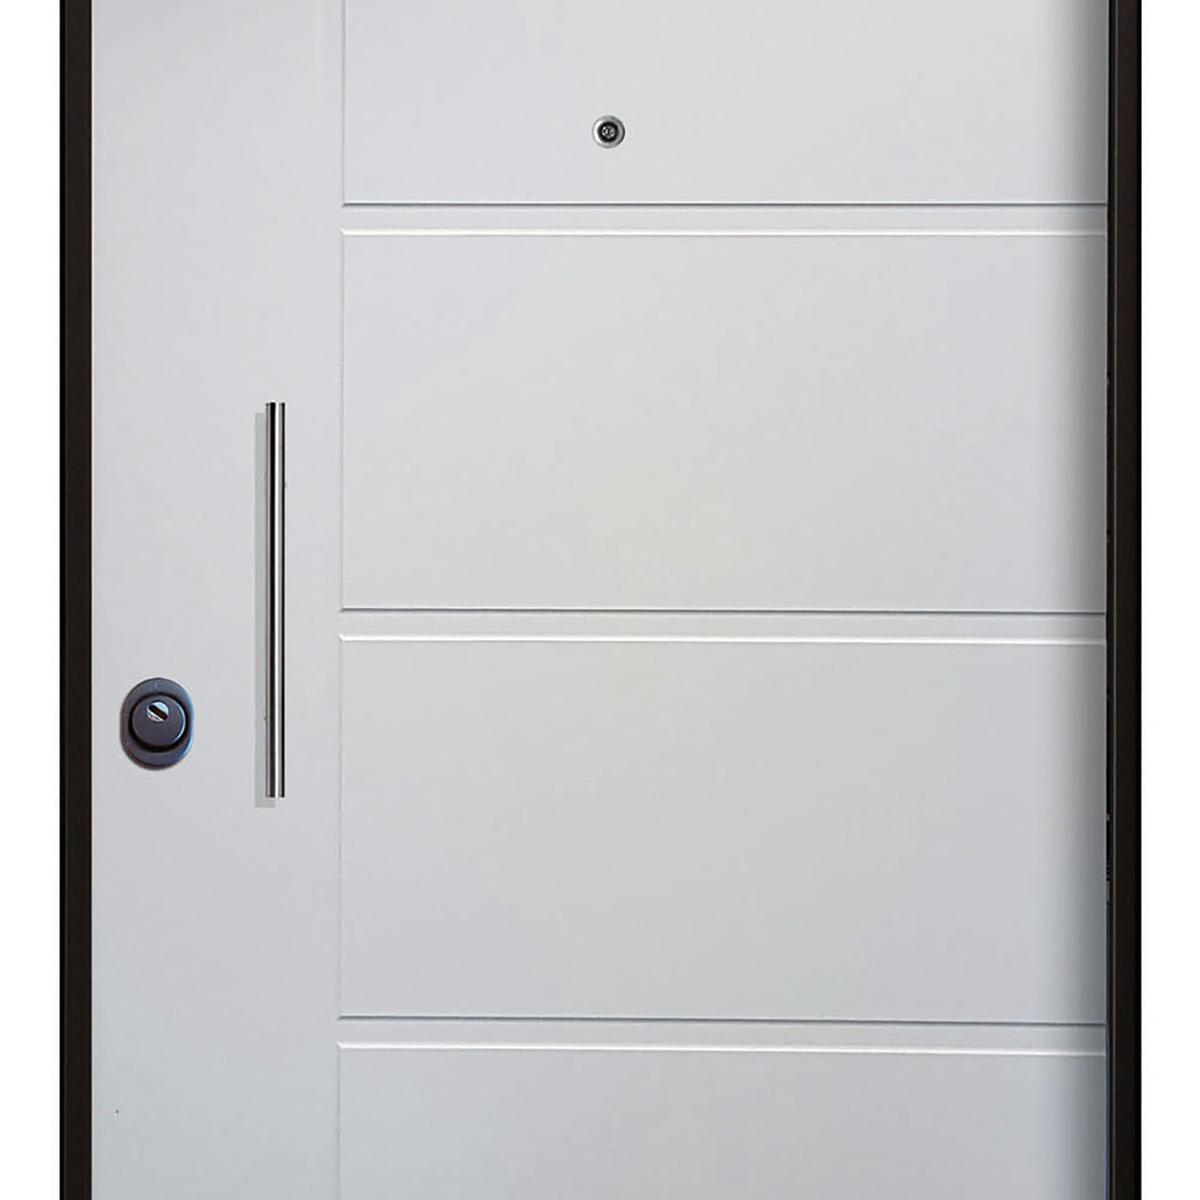 Porta blindata Sweet bianco L 80 x H 210 cm destra - 5